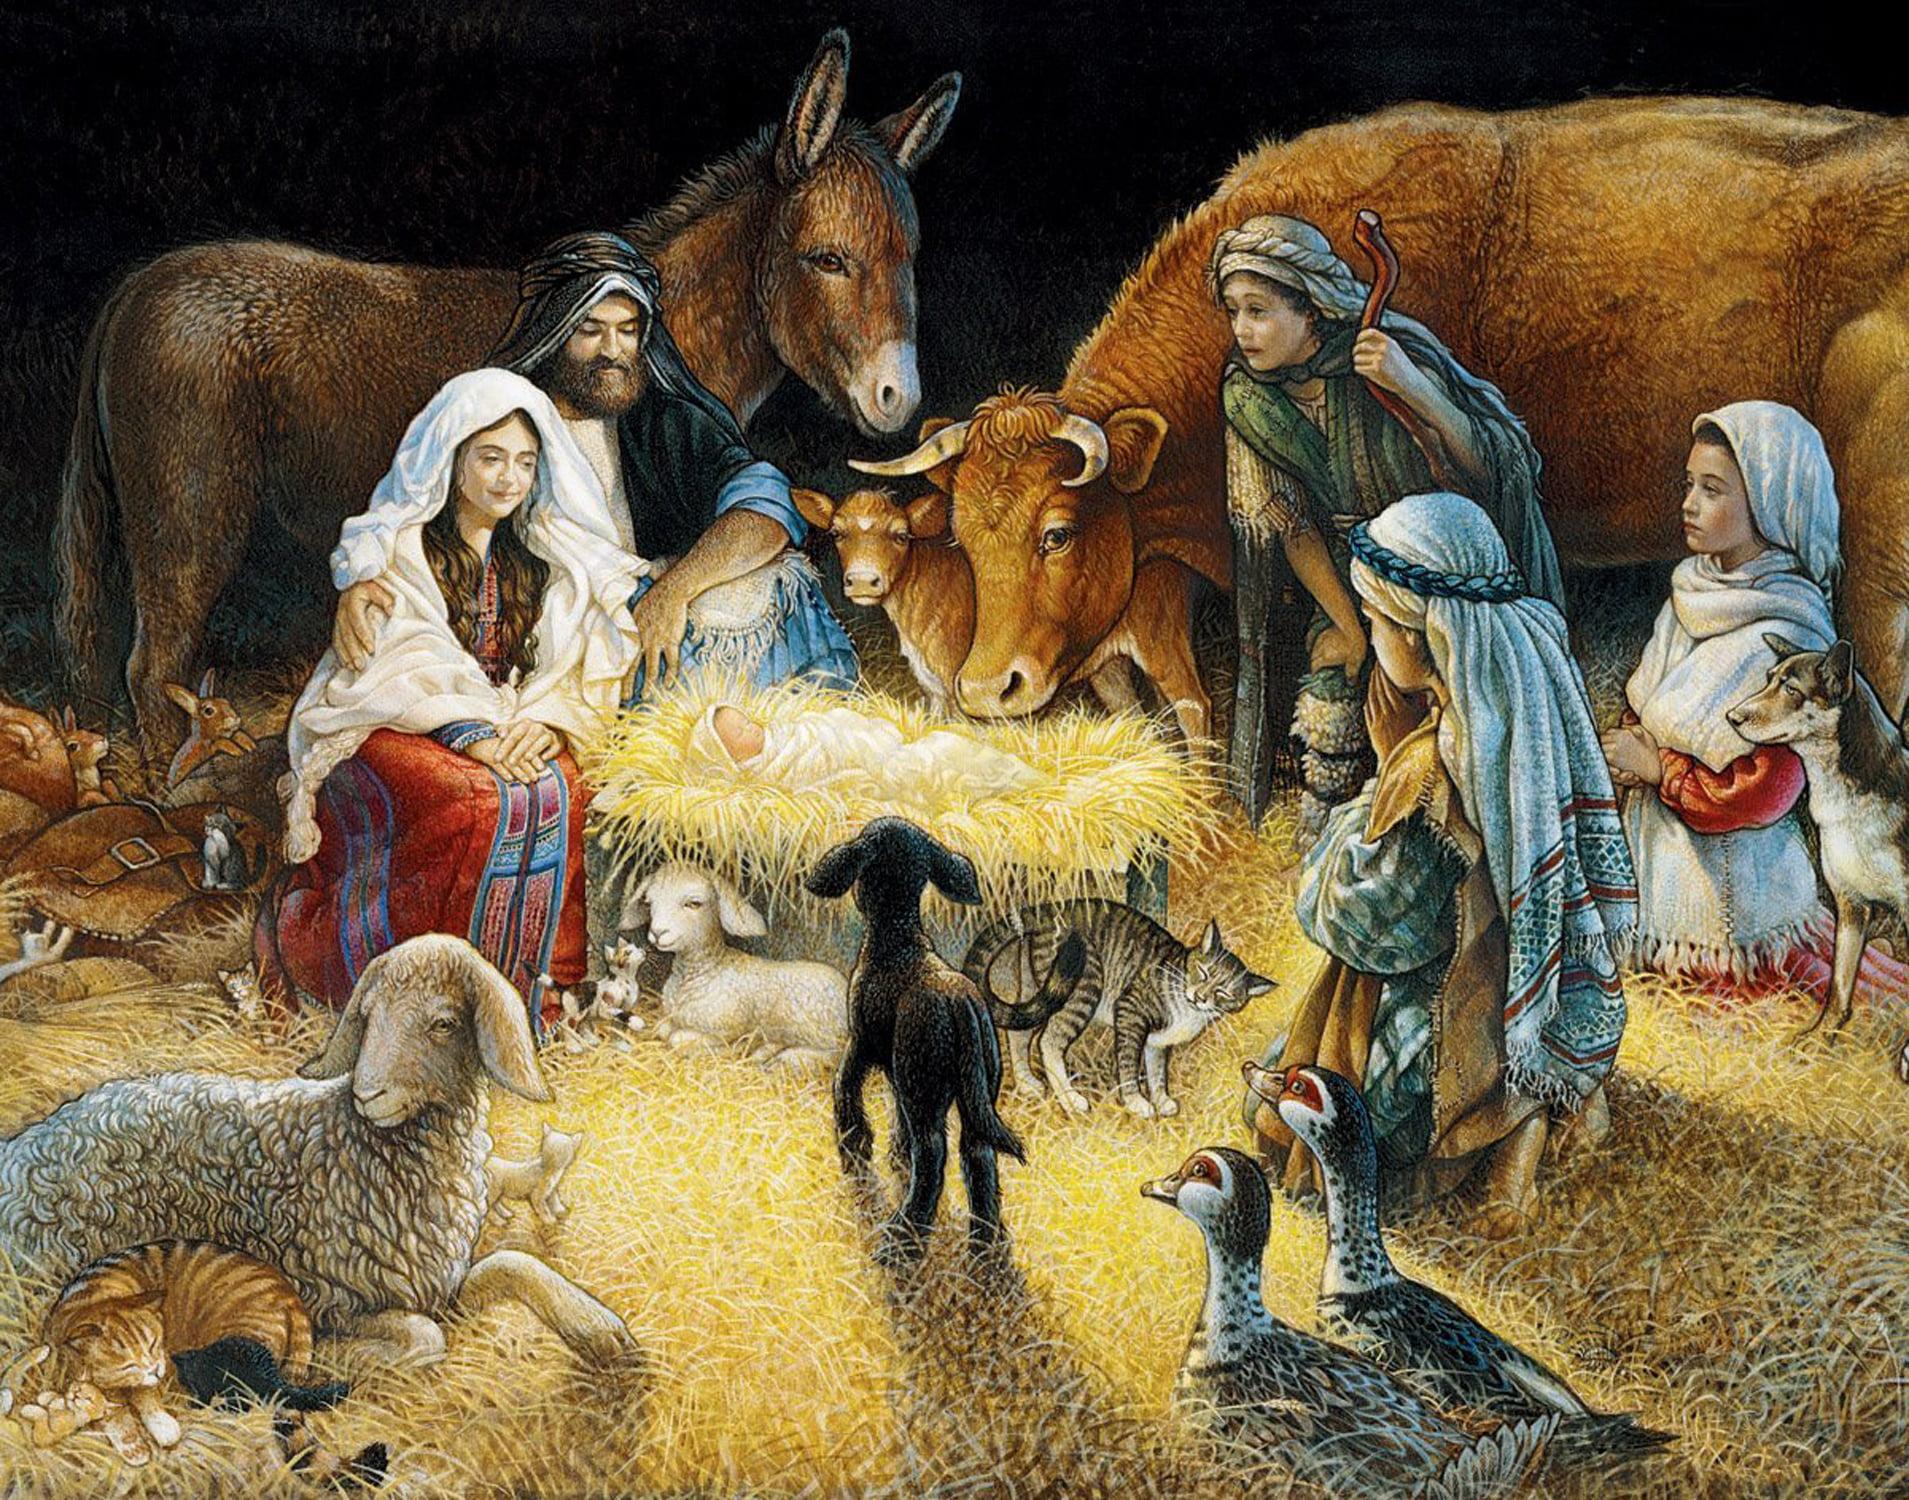 White Mountain Puzzles O Night Divine Nativity -1000 Piece Jigsaw Puzzle by White Mountain Puzzles